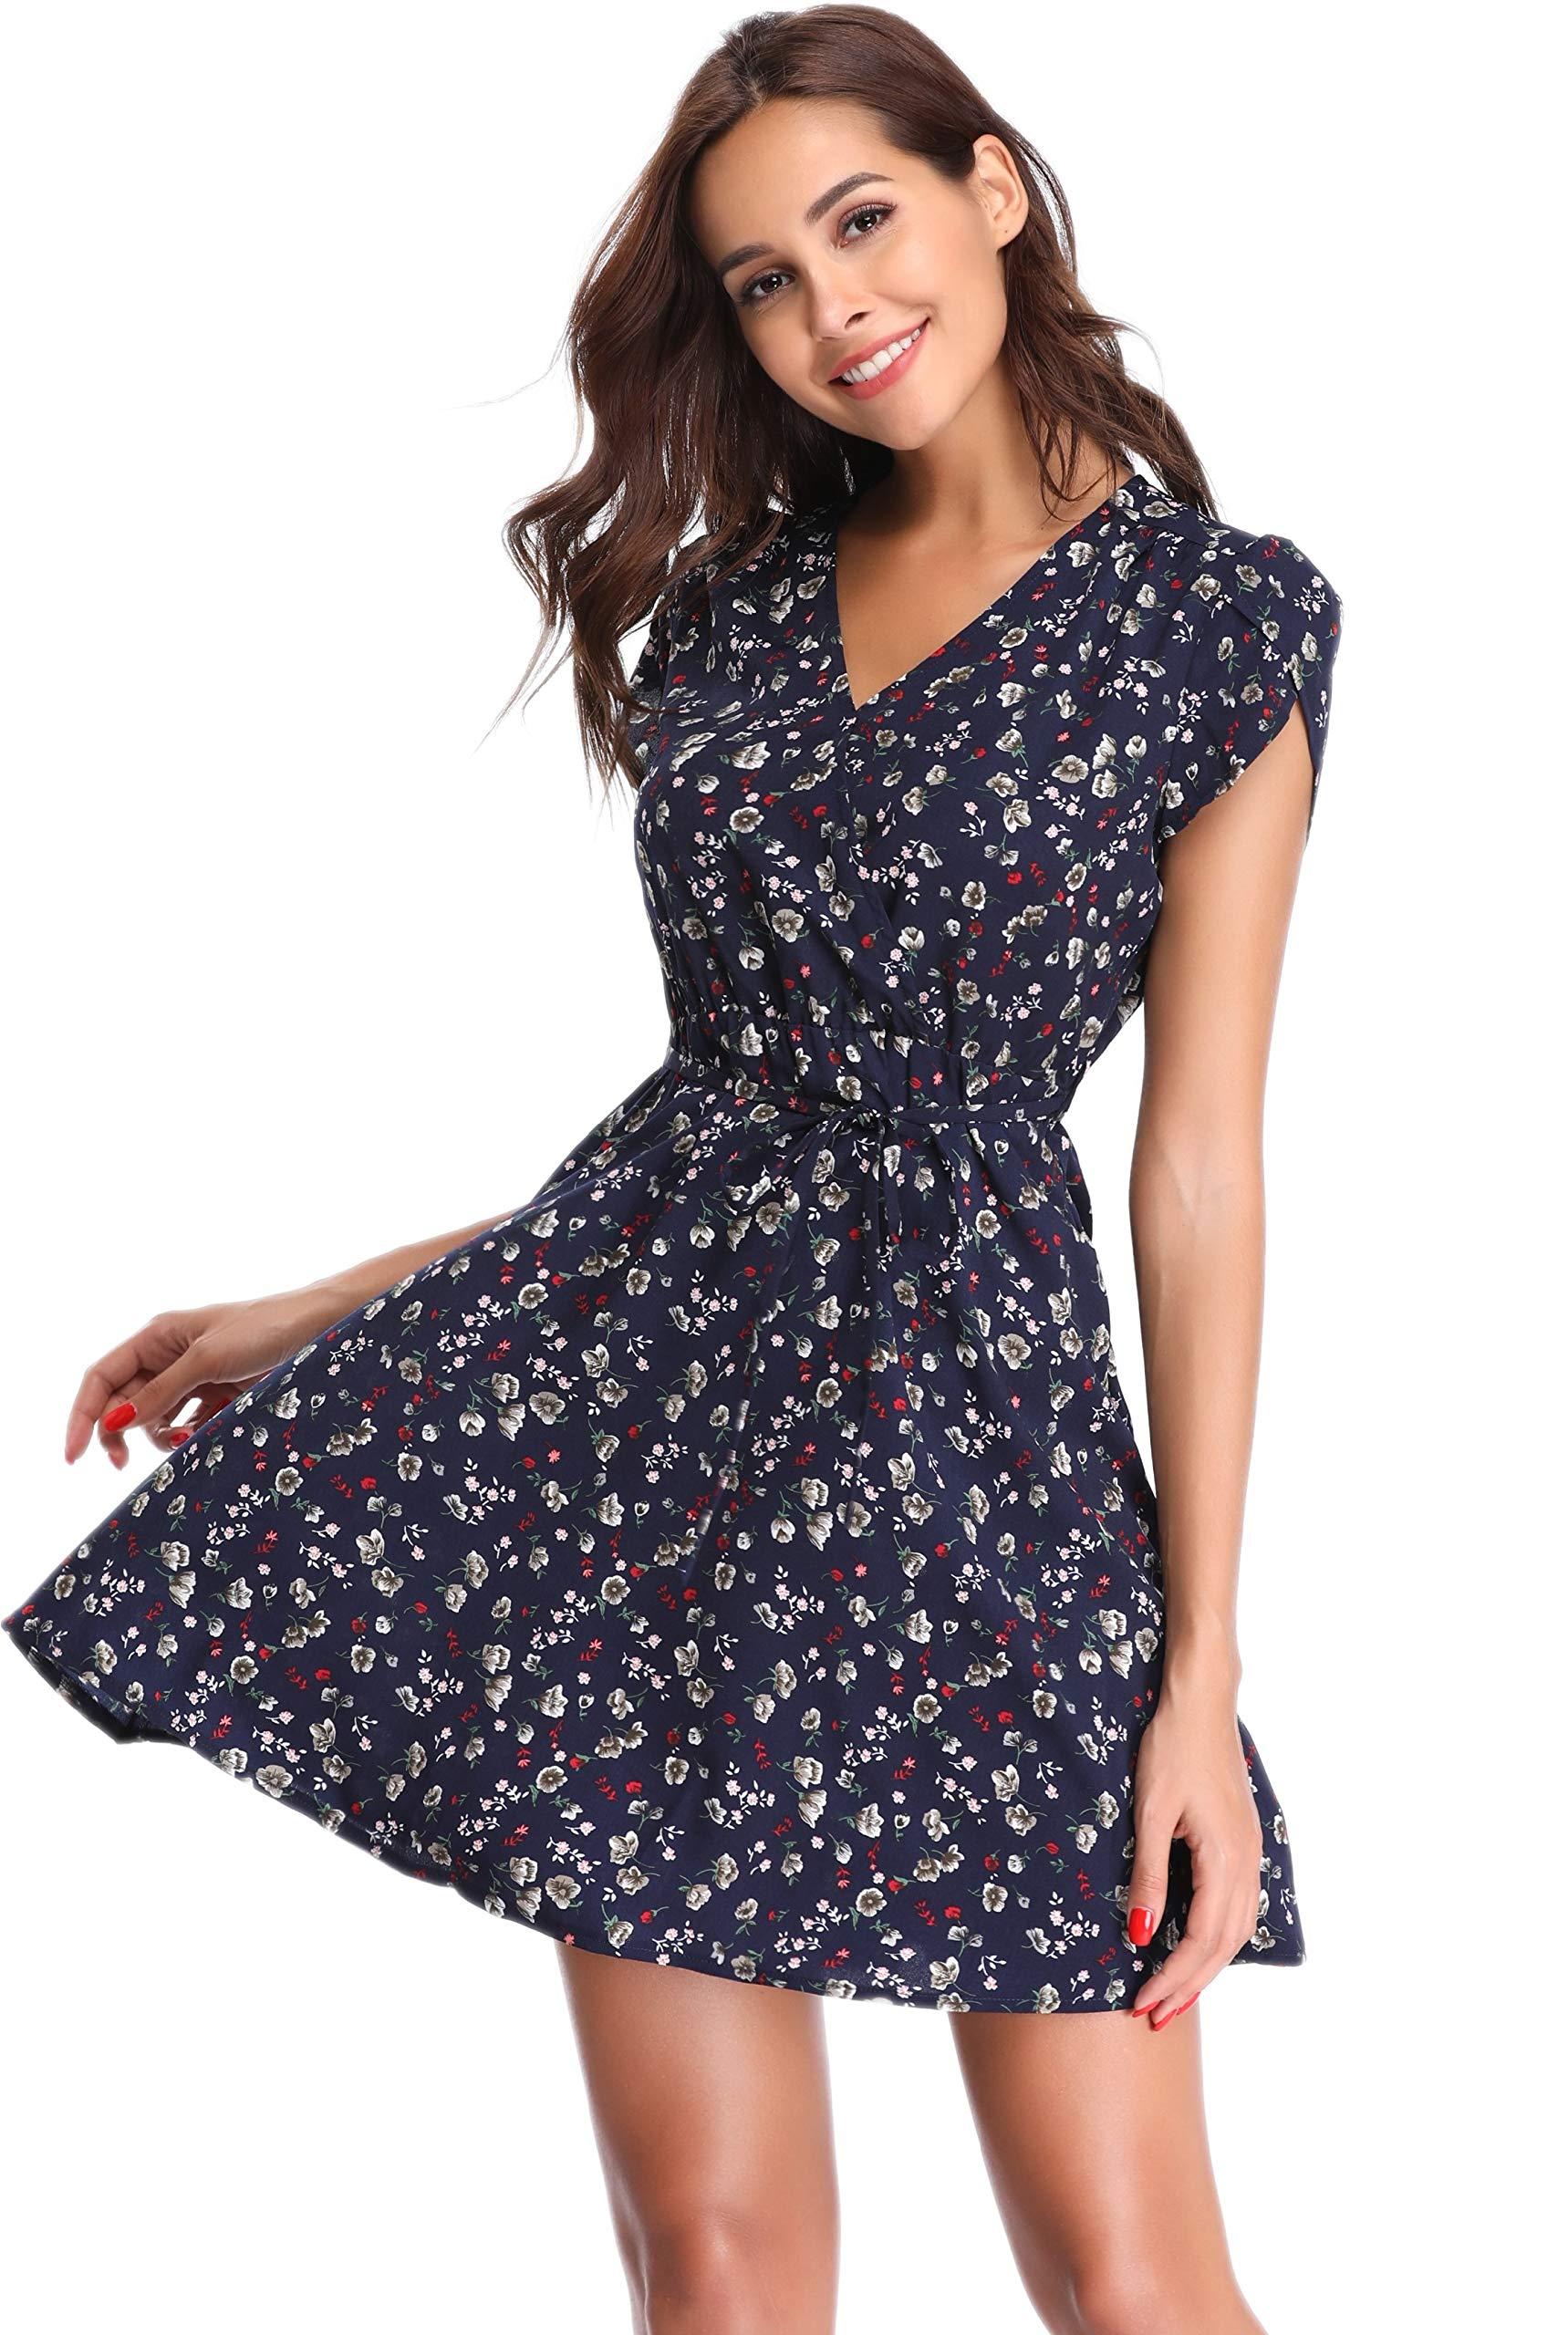 Argstar Women's Short Floral Dress Boho Short Sleeves V Neck Casual Mini Dress